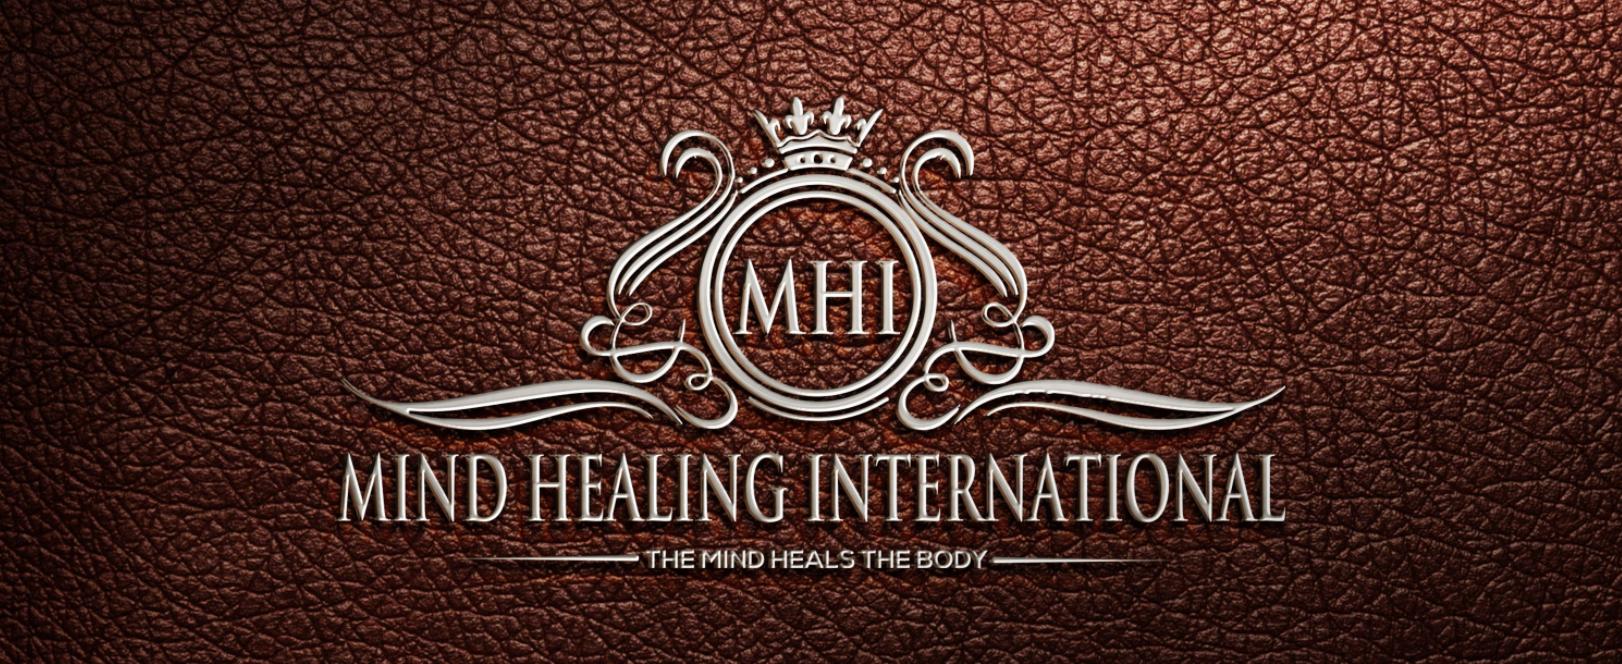 mind-healing-international